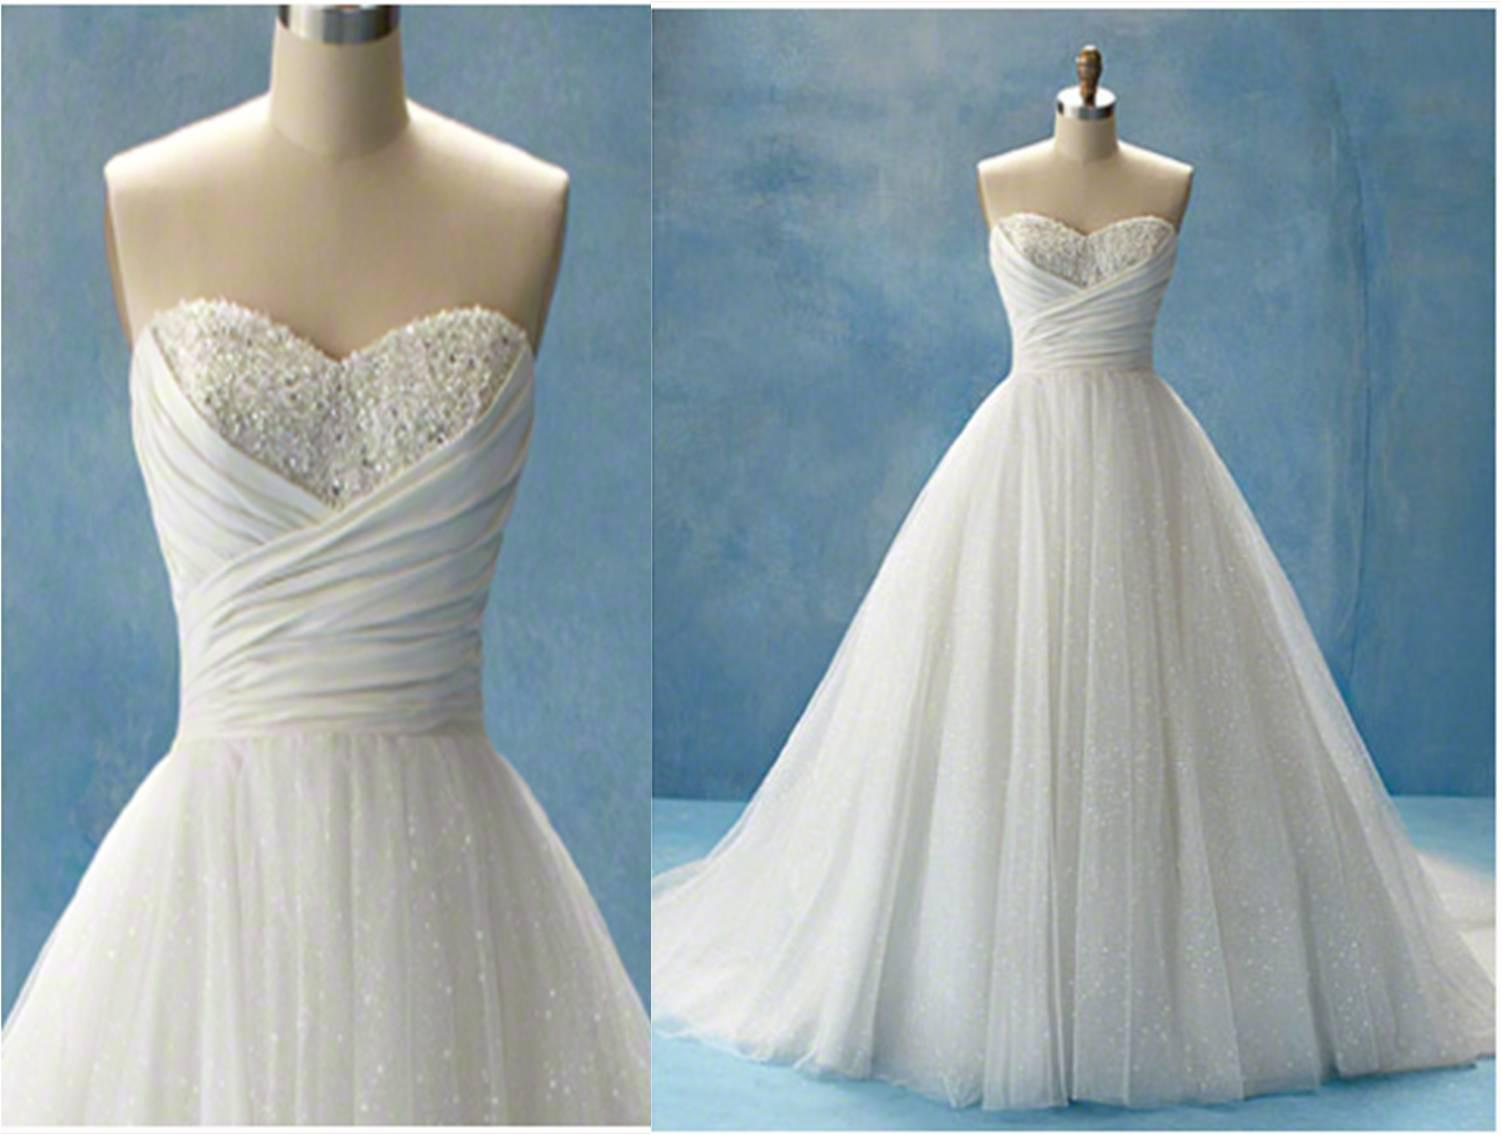 Bling Wedding Dresses On Manikins – Page 3 – fashion dresses